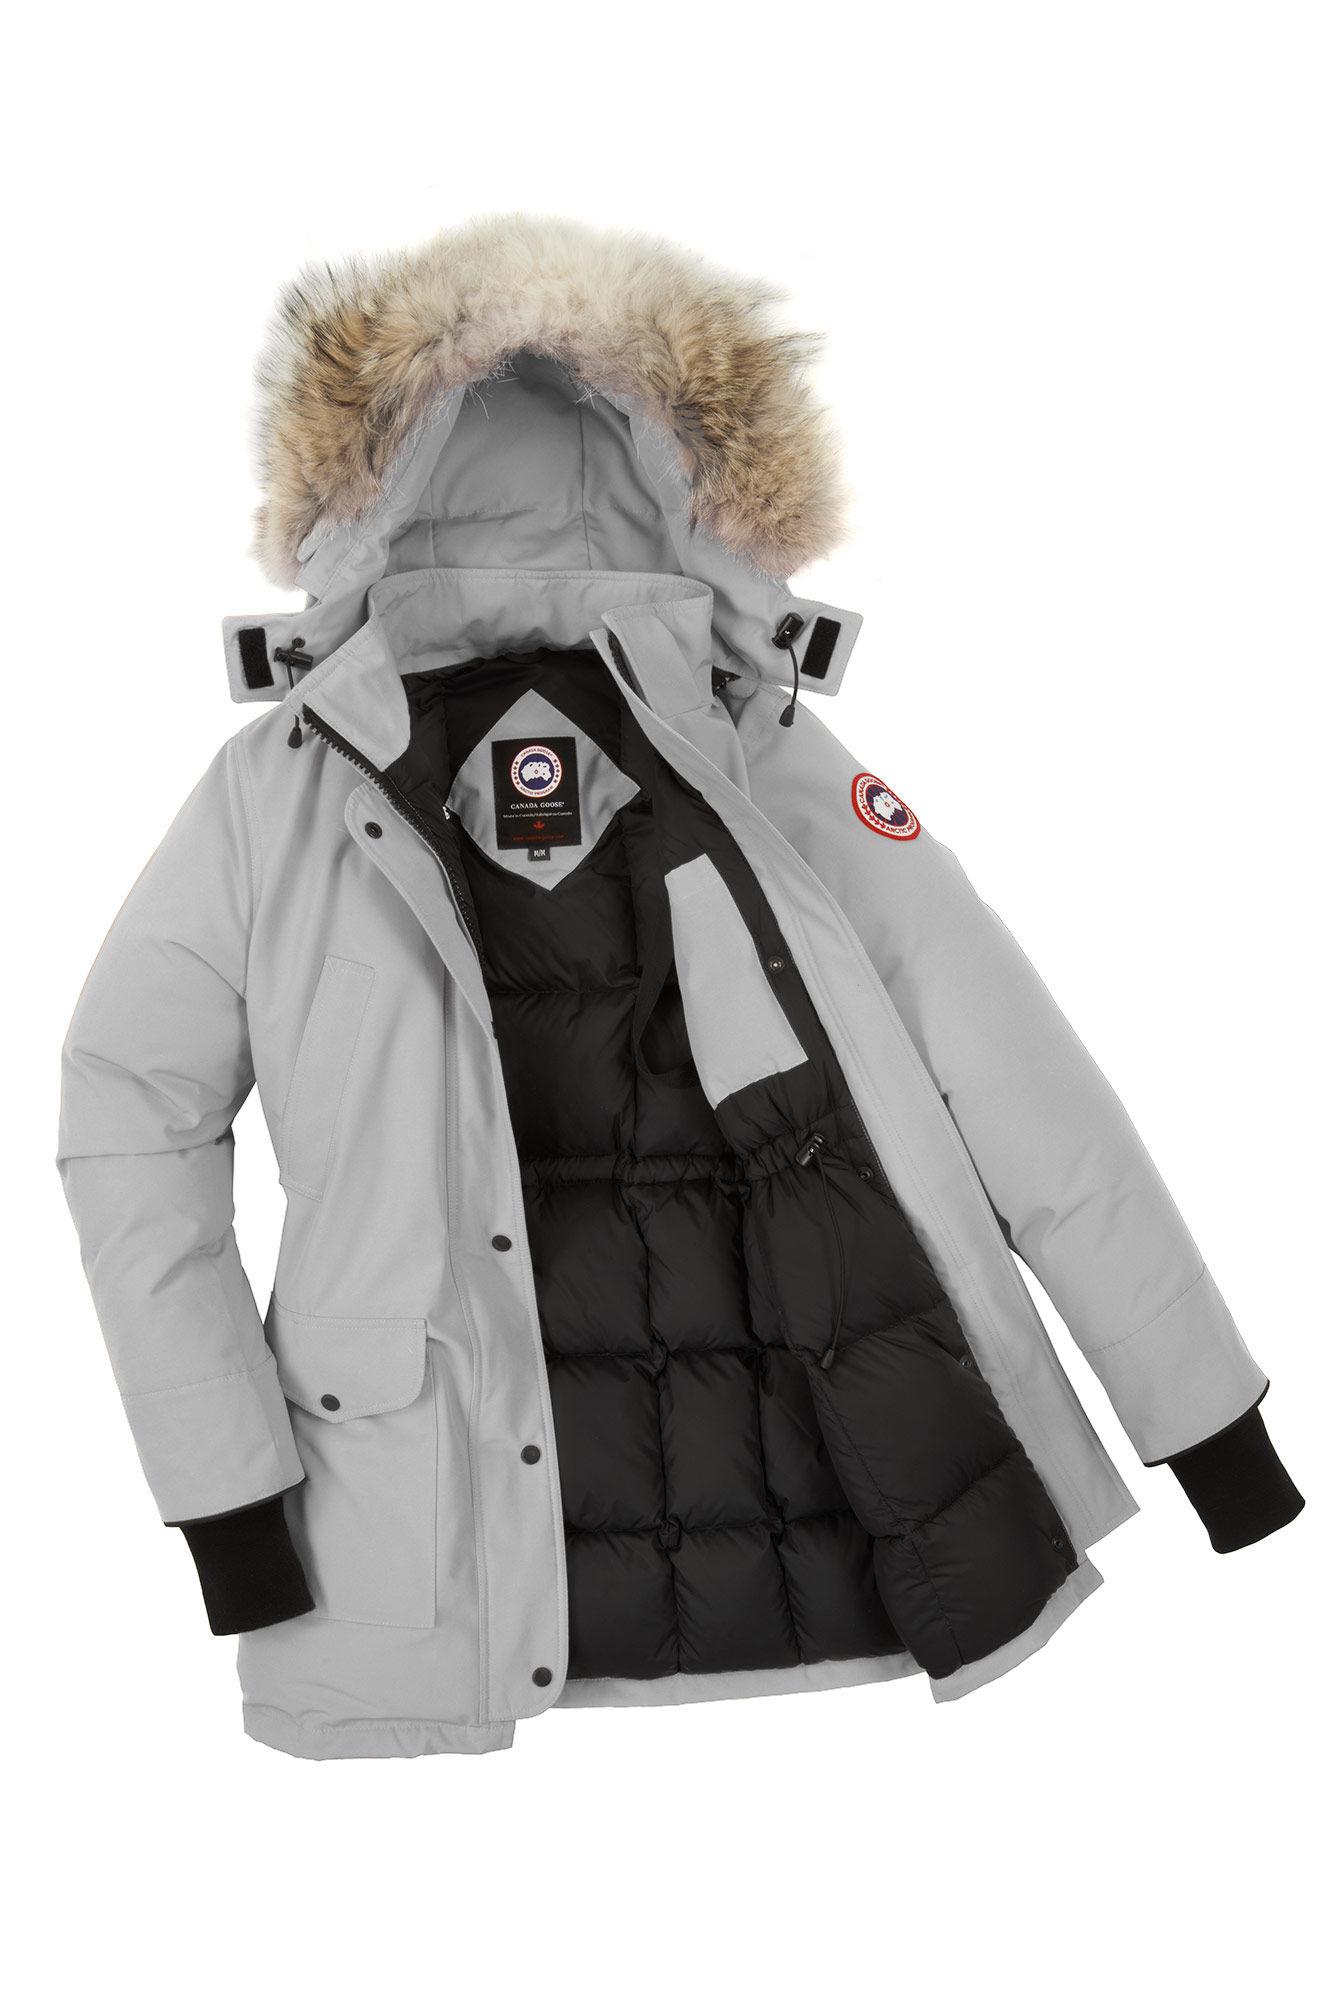 Canada Goose' Trillium Women's Silver Birch Parka Fur Trim Coat